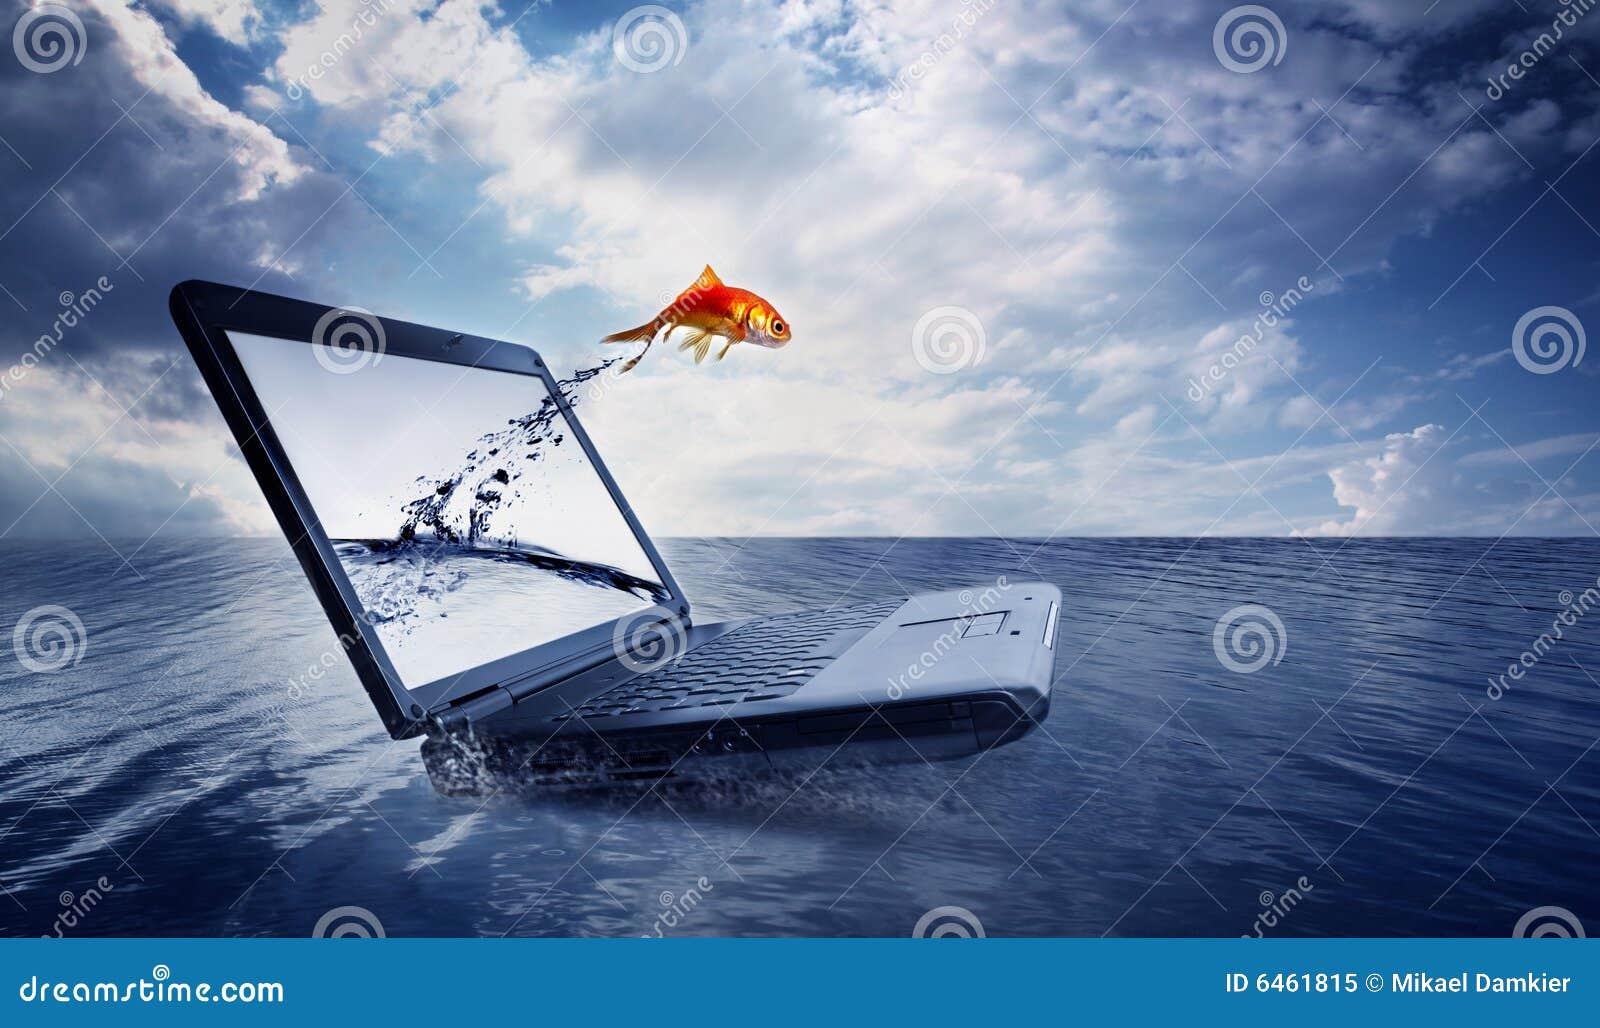 Skacze rybki monitor oceanu.